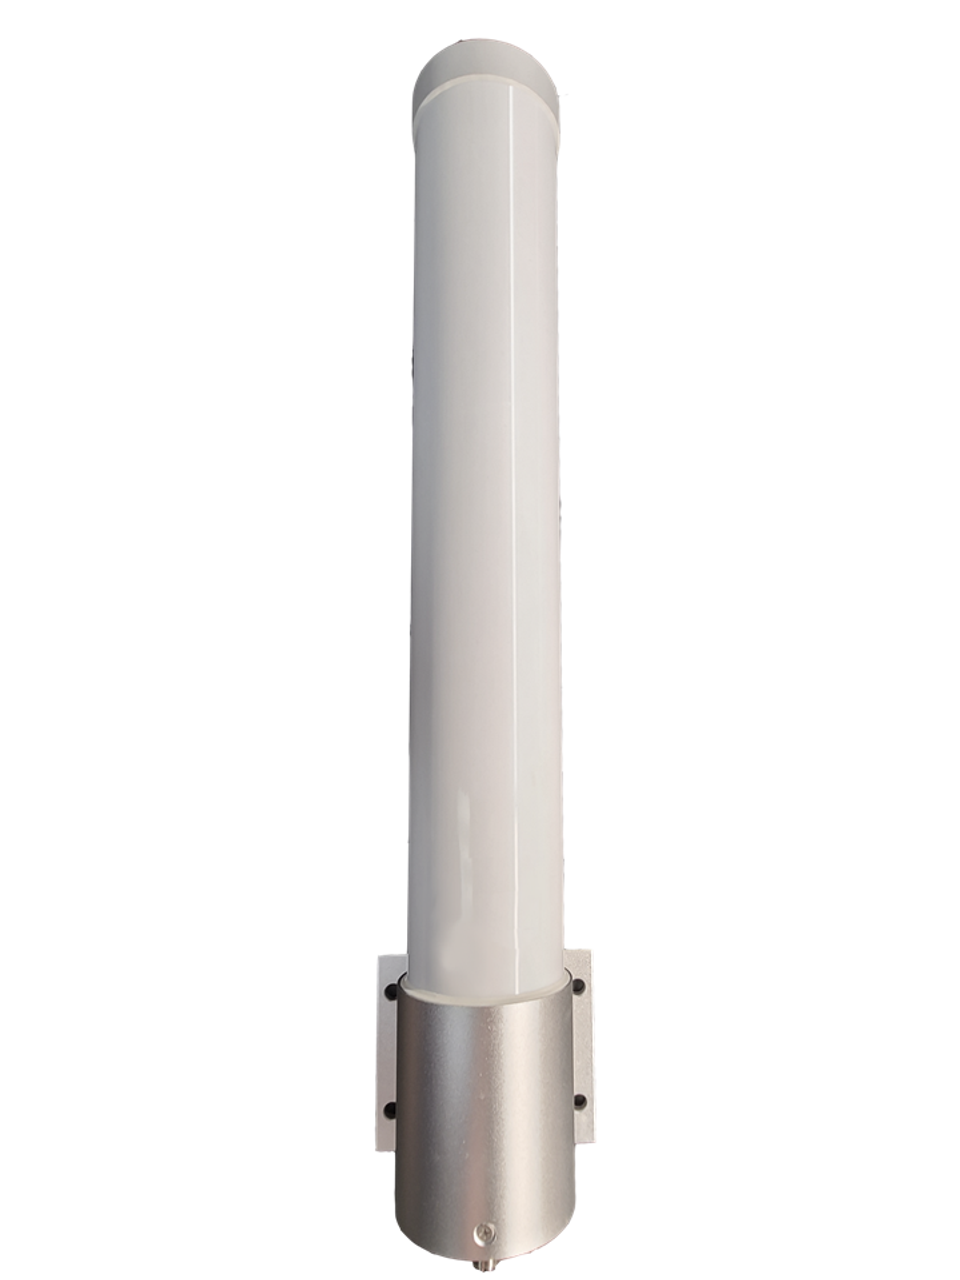 M25T Omni Directional T-Mobile 4G 5G NR (Band 71 Optimized) / Dual Band WIFI Antenna w/Bracket Mount - N Female